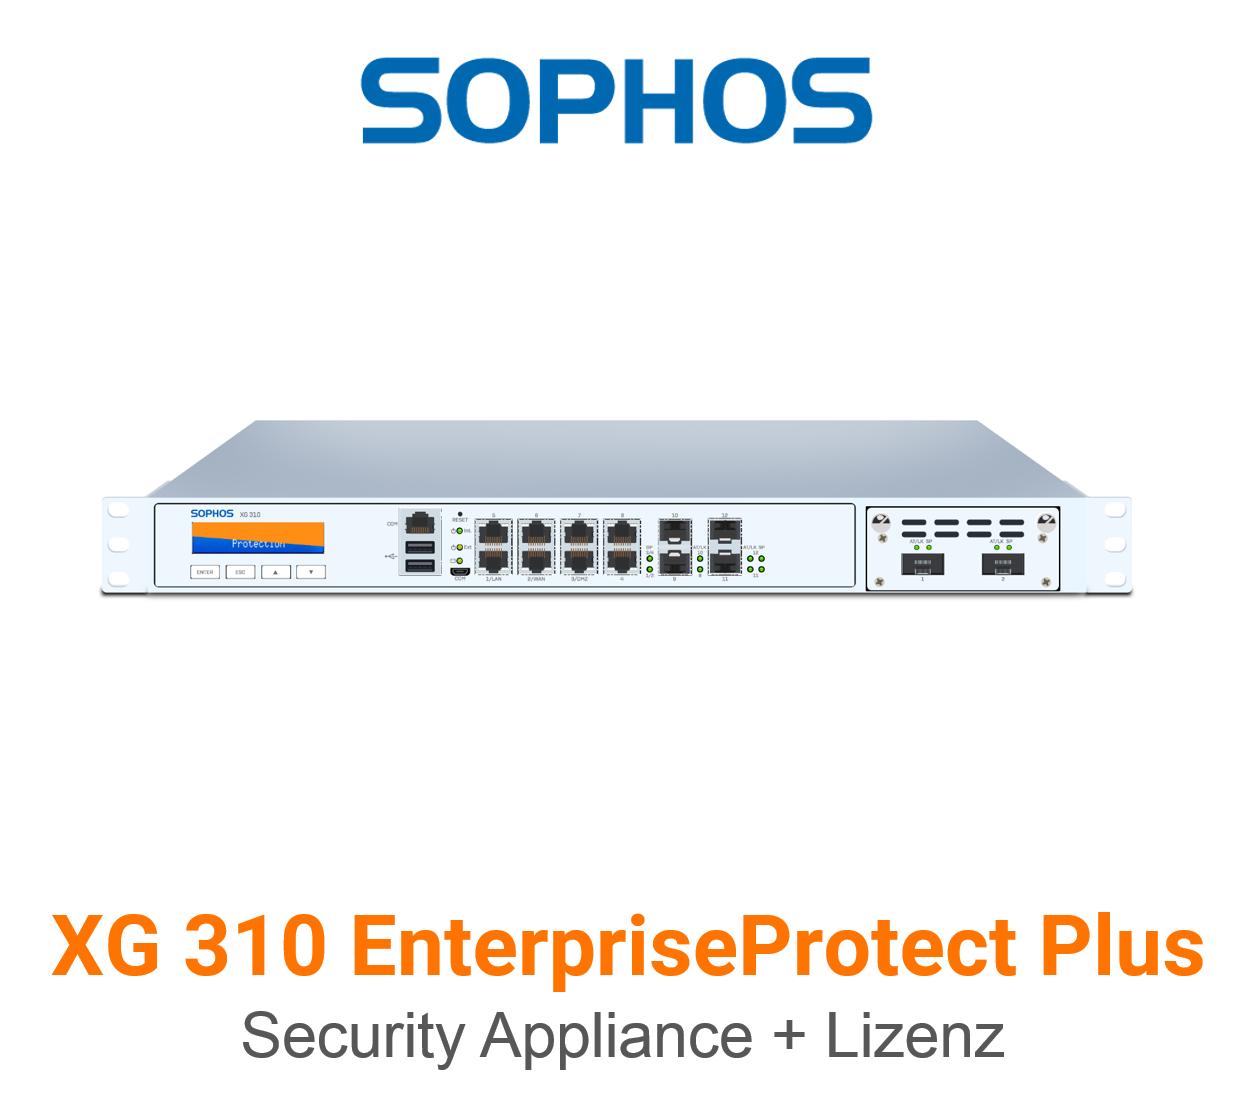 Sophos XG 310 EnterpriseProtect Plus Bundle (Hardware + Lizenz)